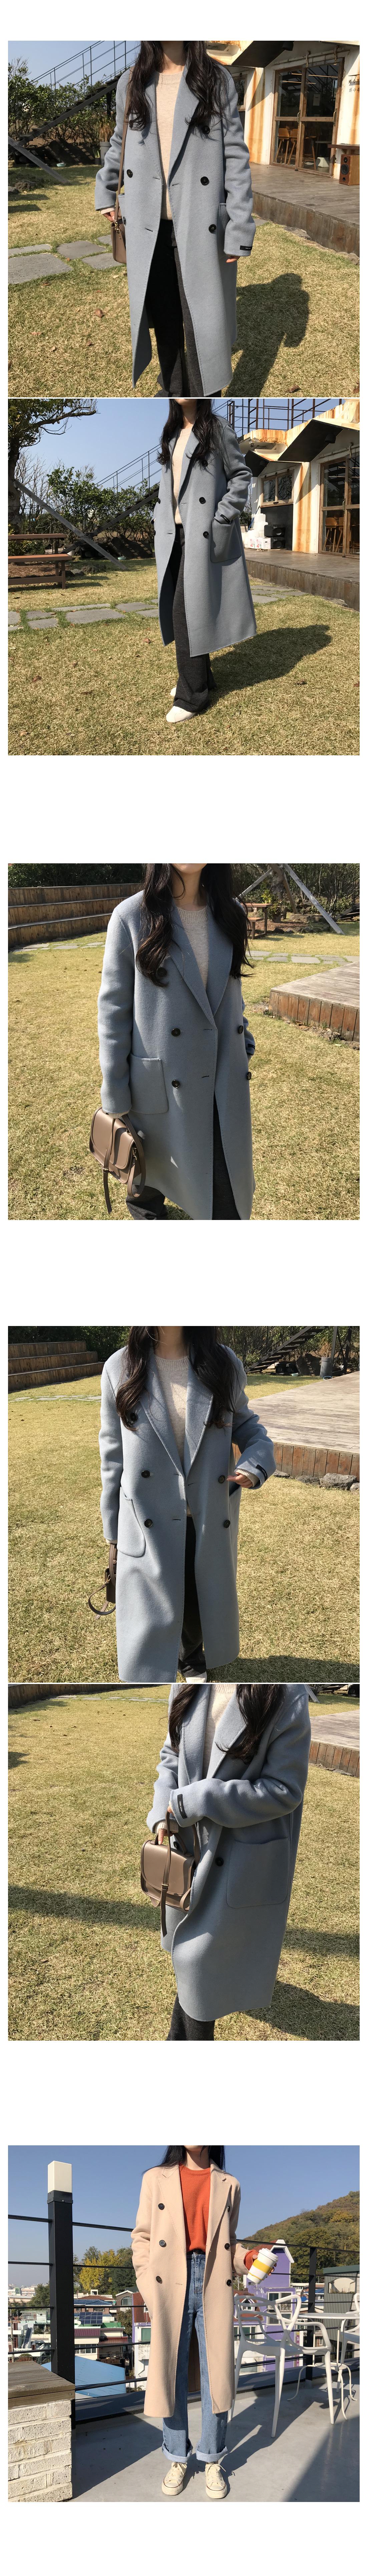 Egg double long handmade coat